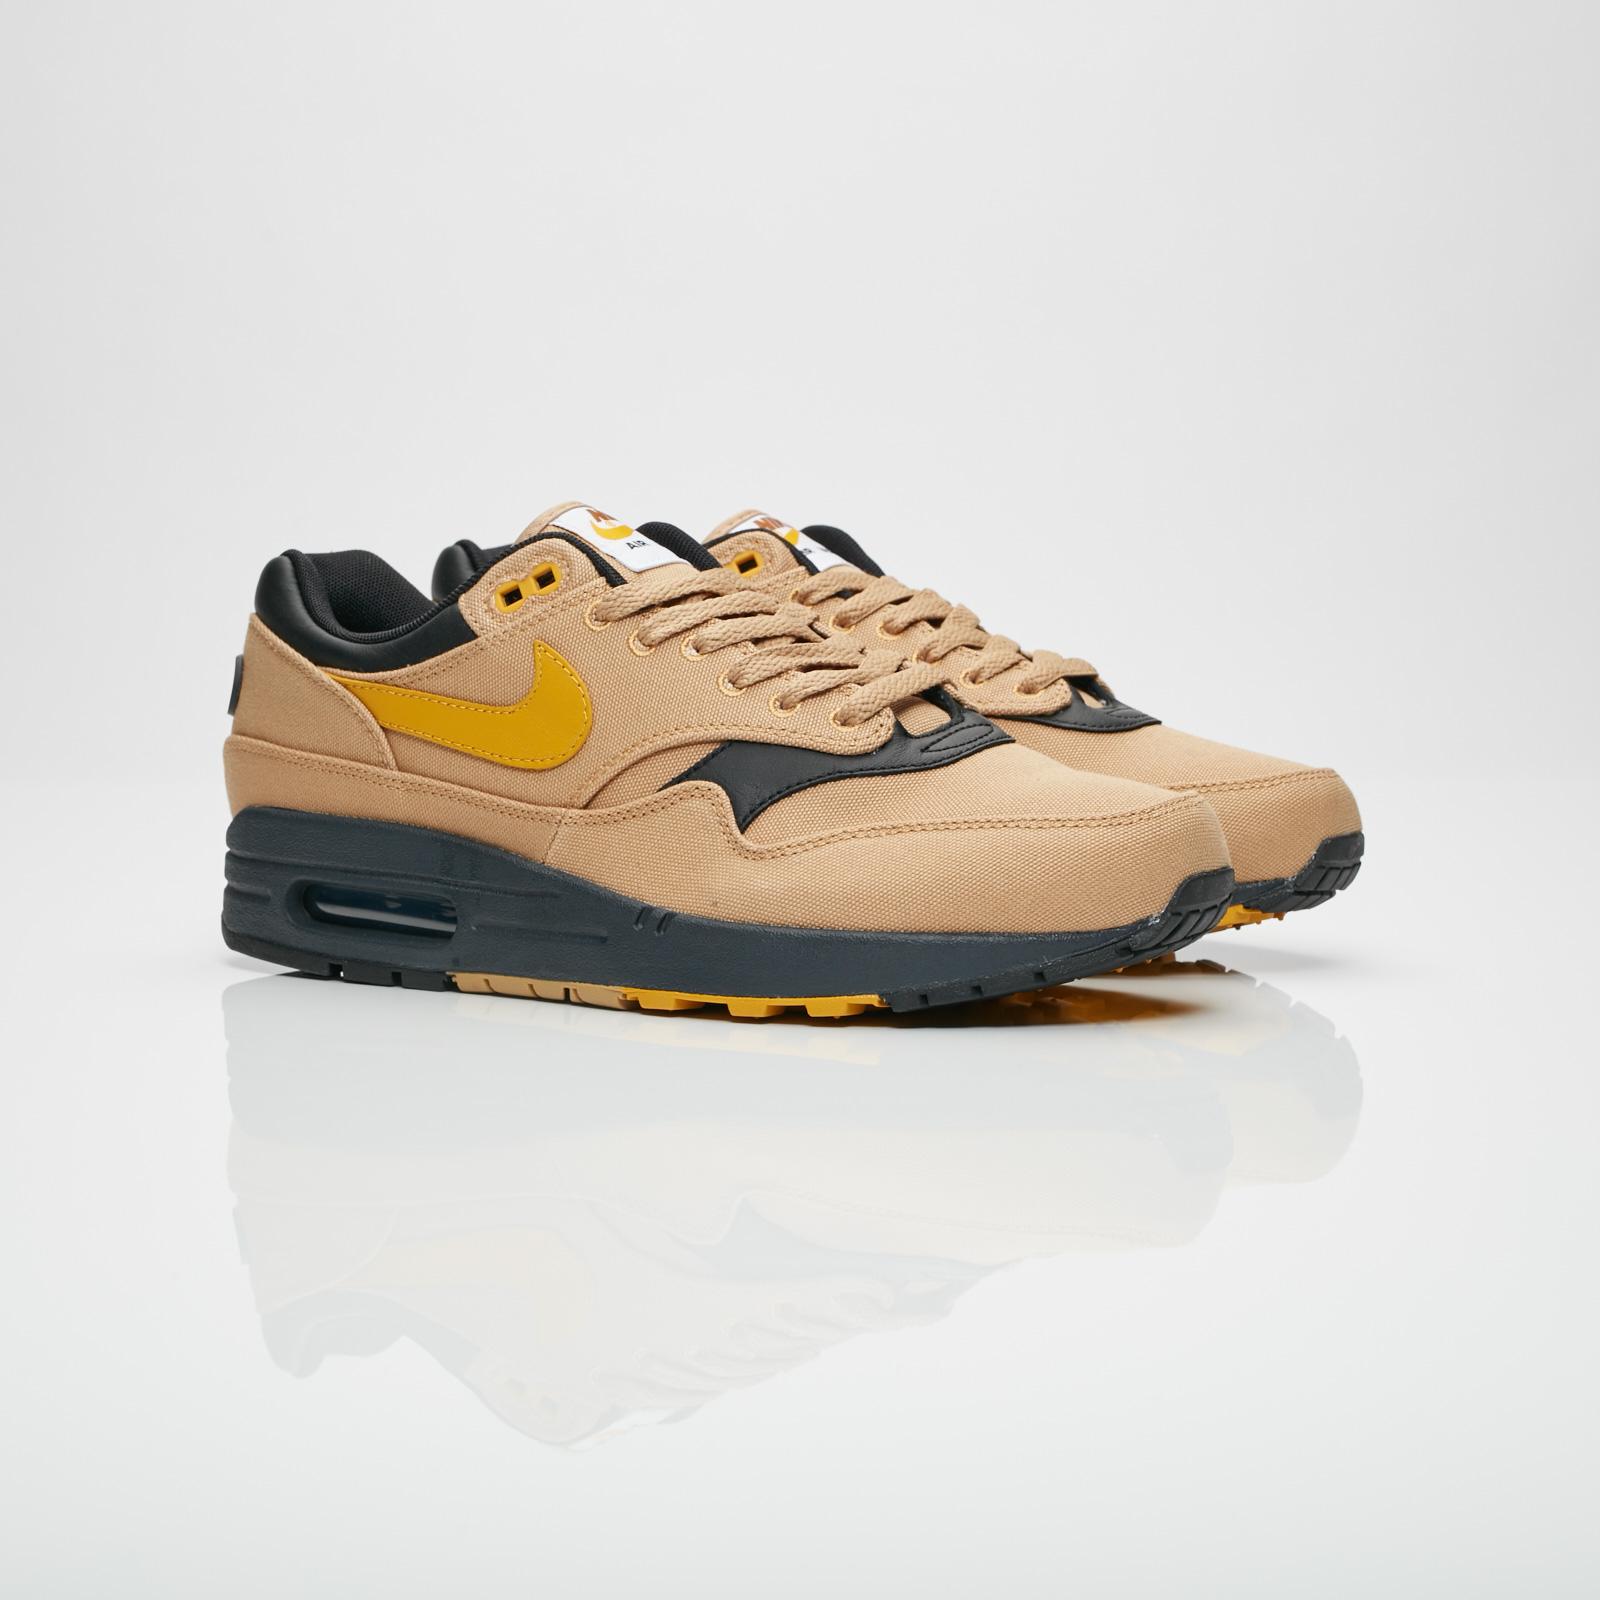 quality design cc097 f8cf1 Nike Sportswear Air Max 1 Premium